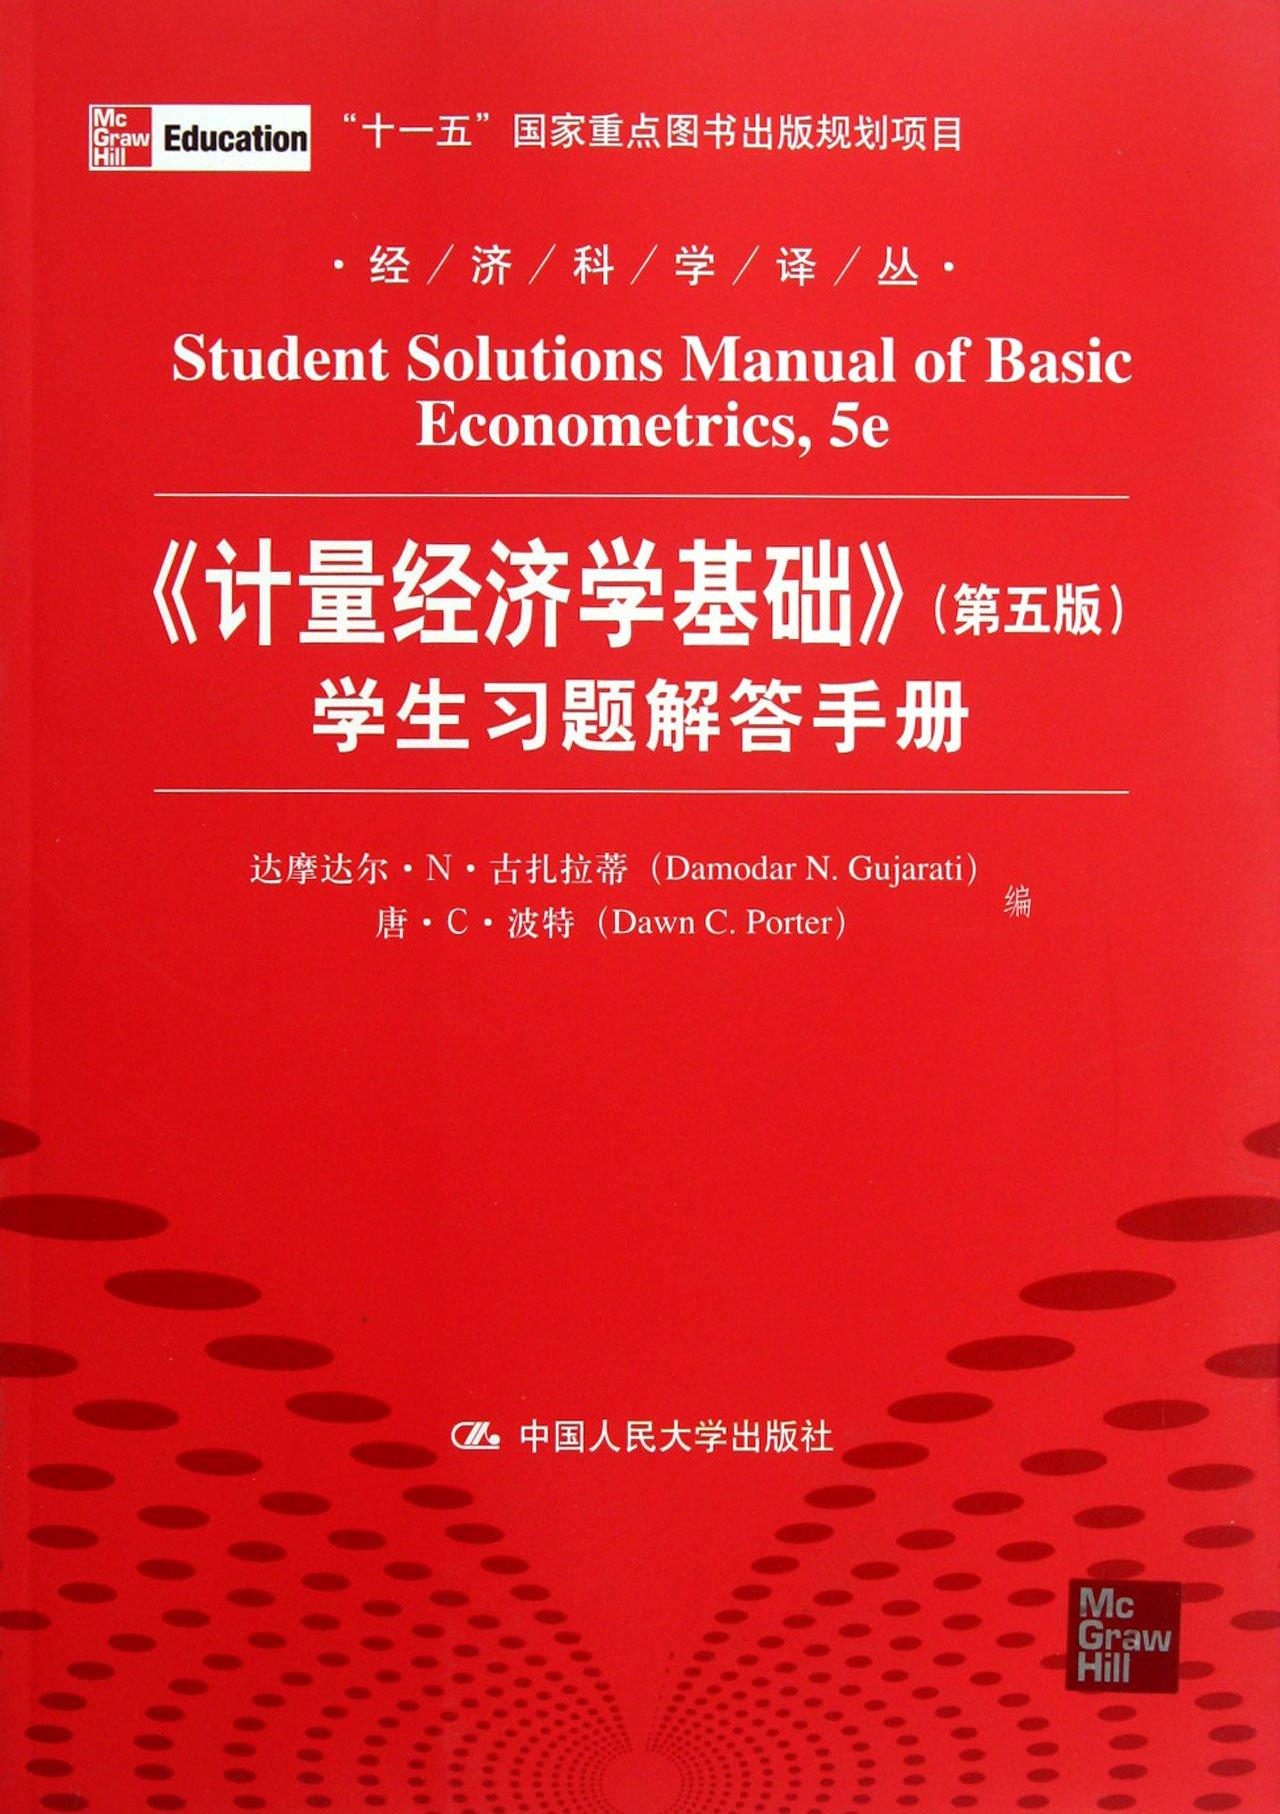 Student Solutions Manual of Basic Econometrics(Fifth Edition) (Chinese  Edition): Damodar N. Gujarati: 9787300150918: Amazon.com: Books